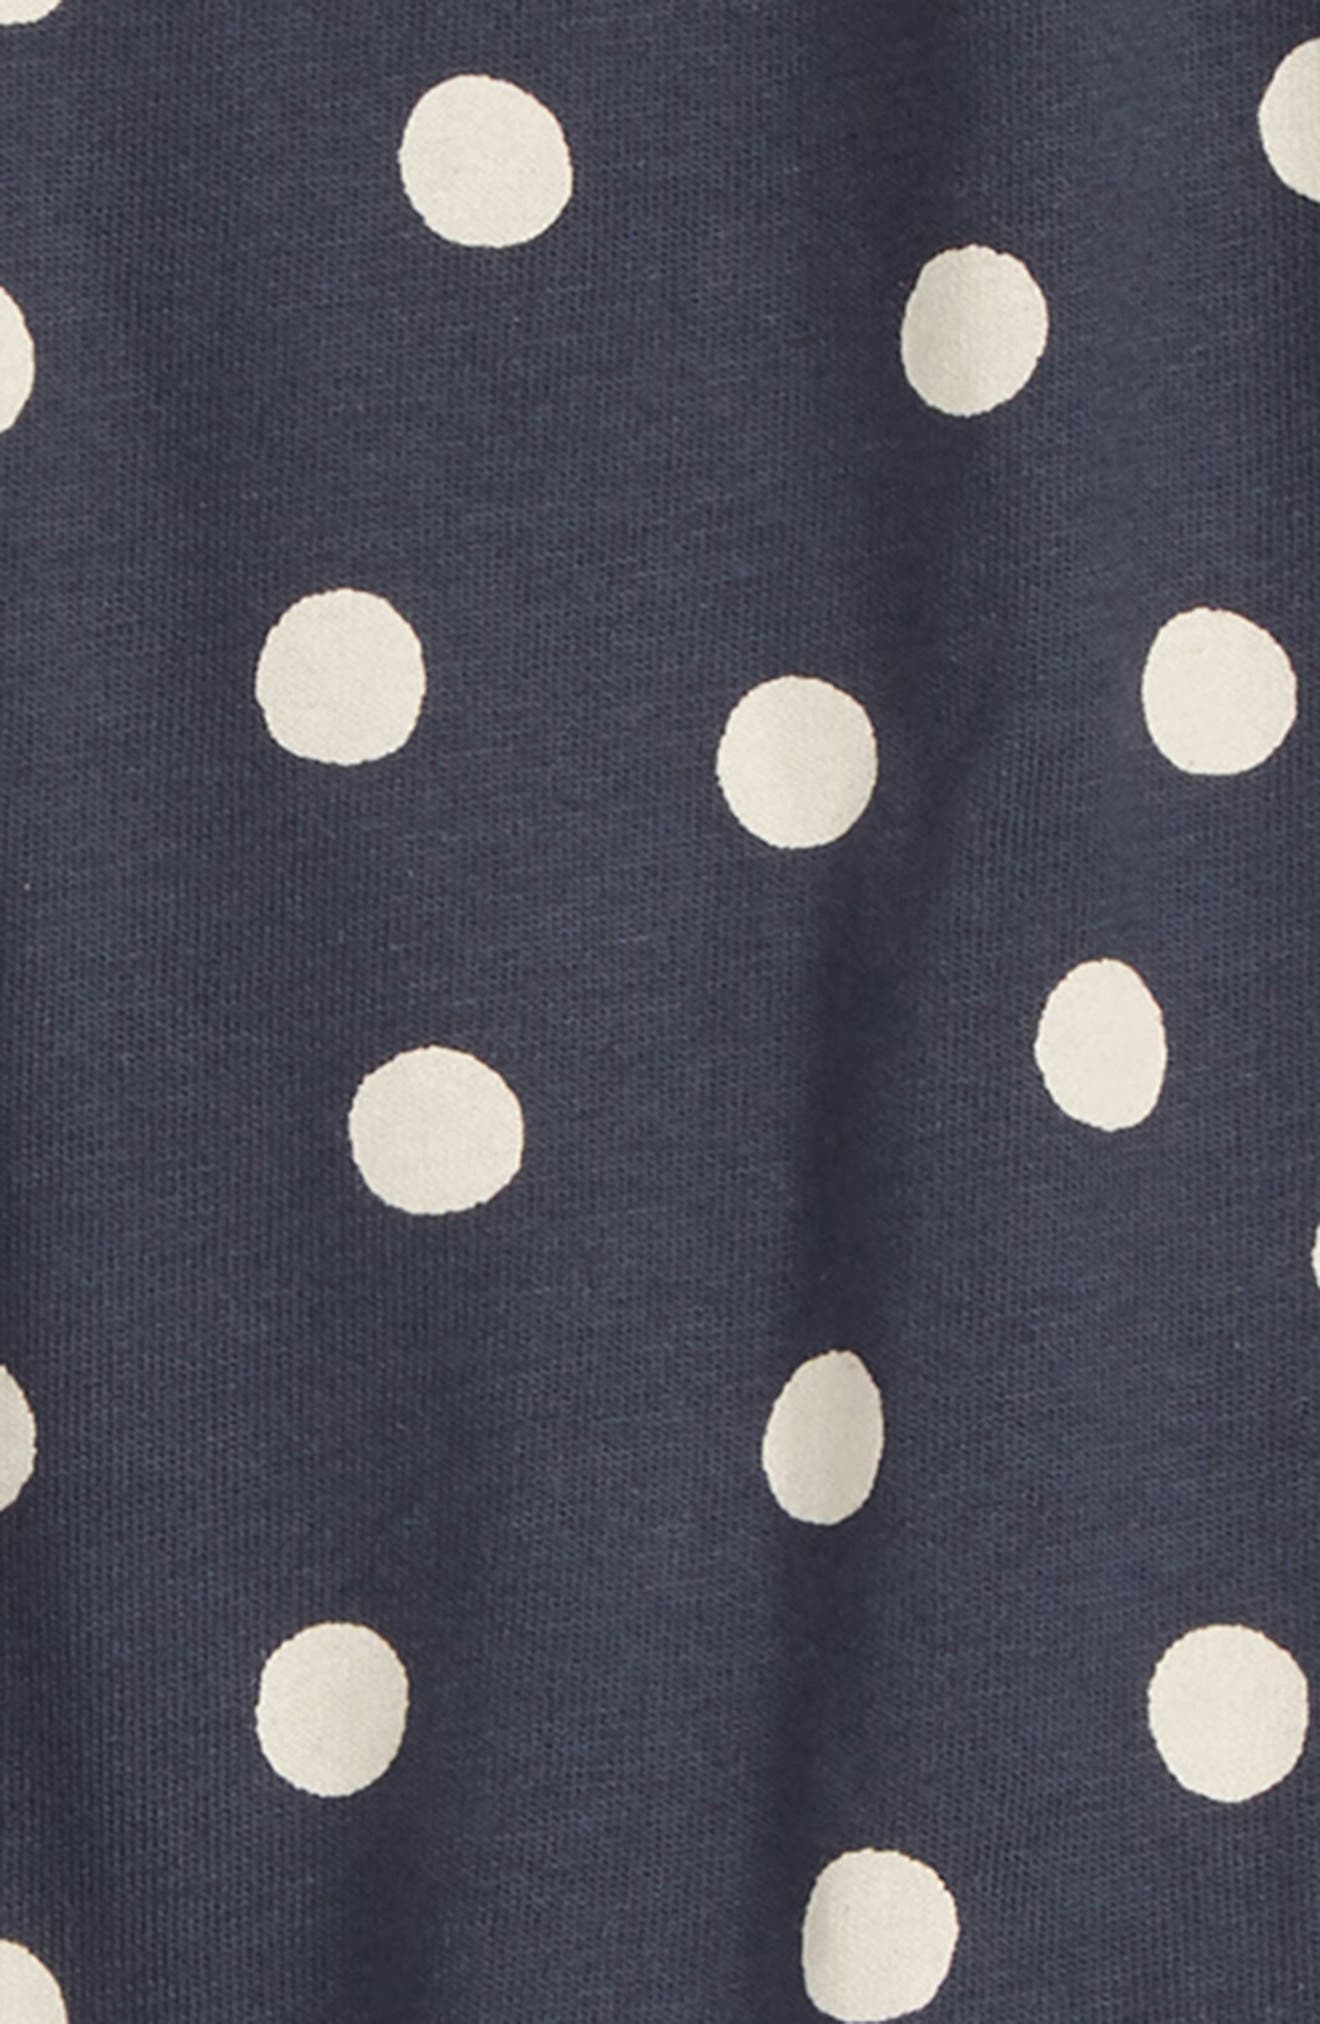 Dot Cotton Romper,                             Alternate thumbnail 2, color,                             482